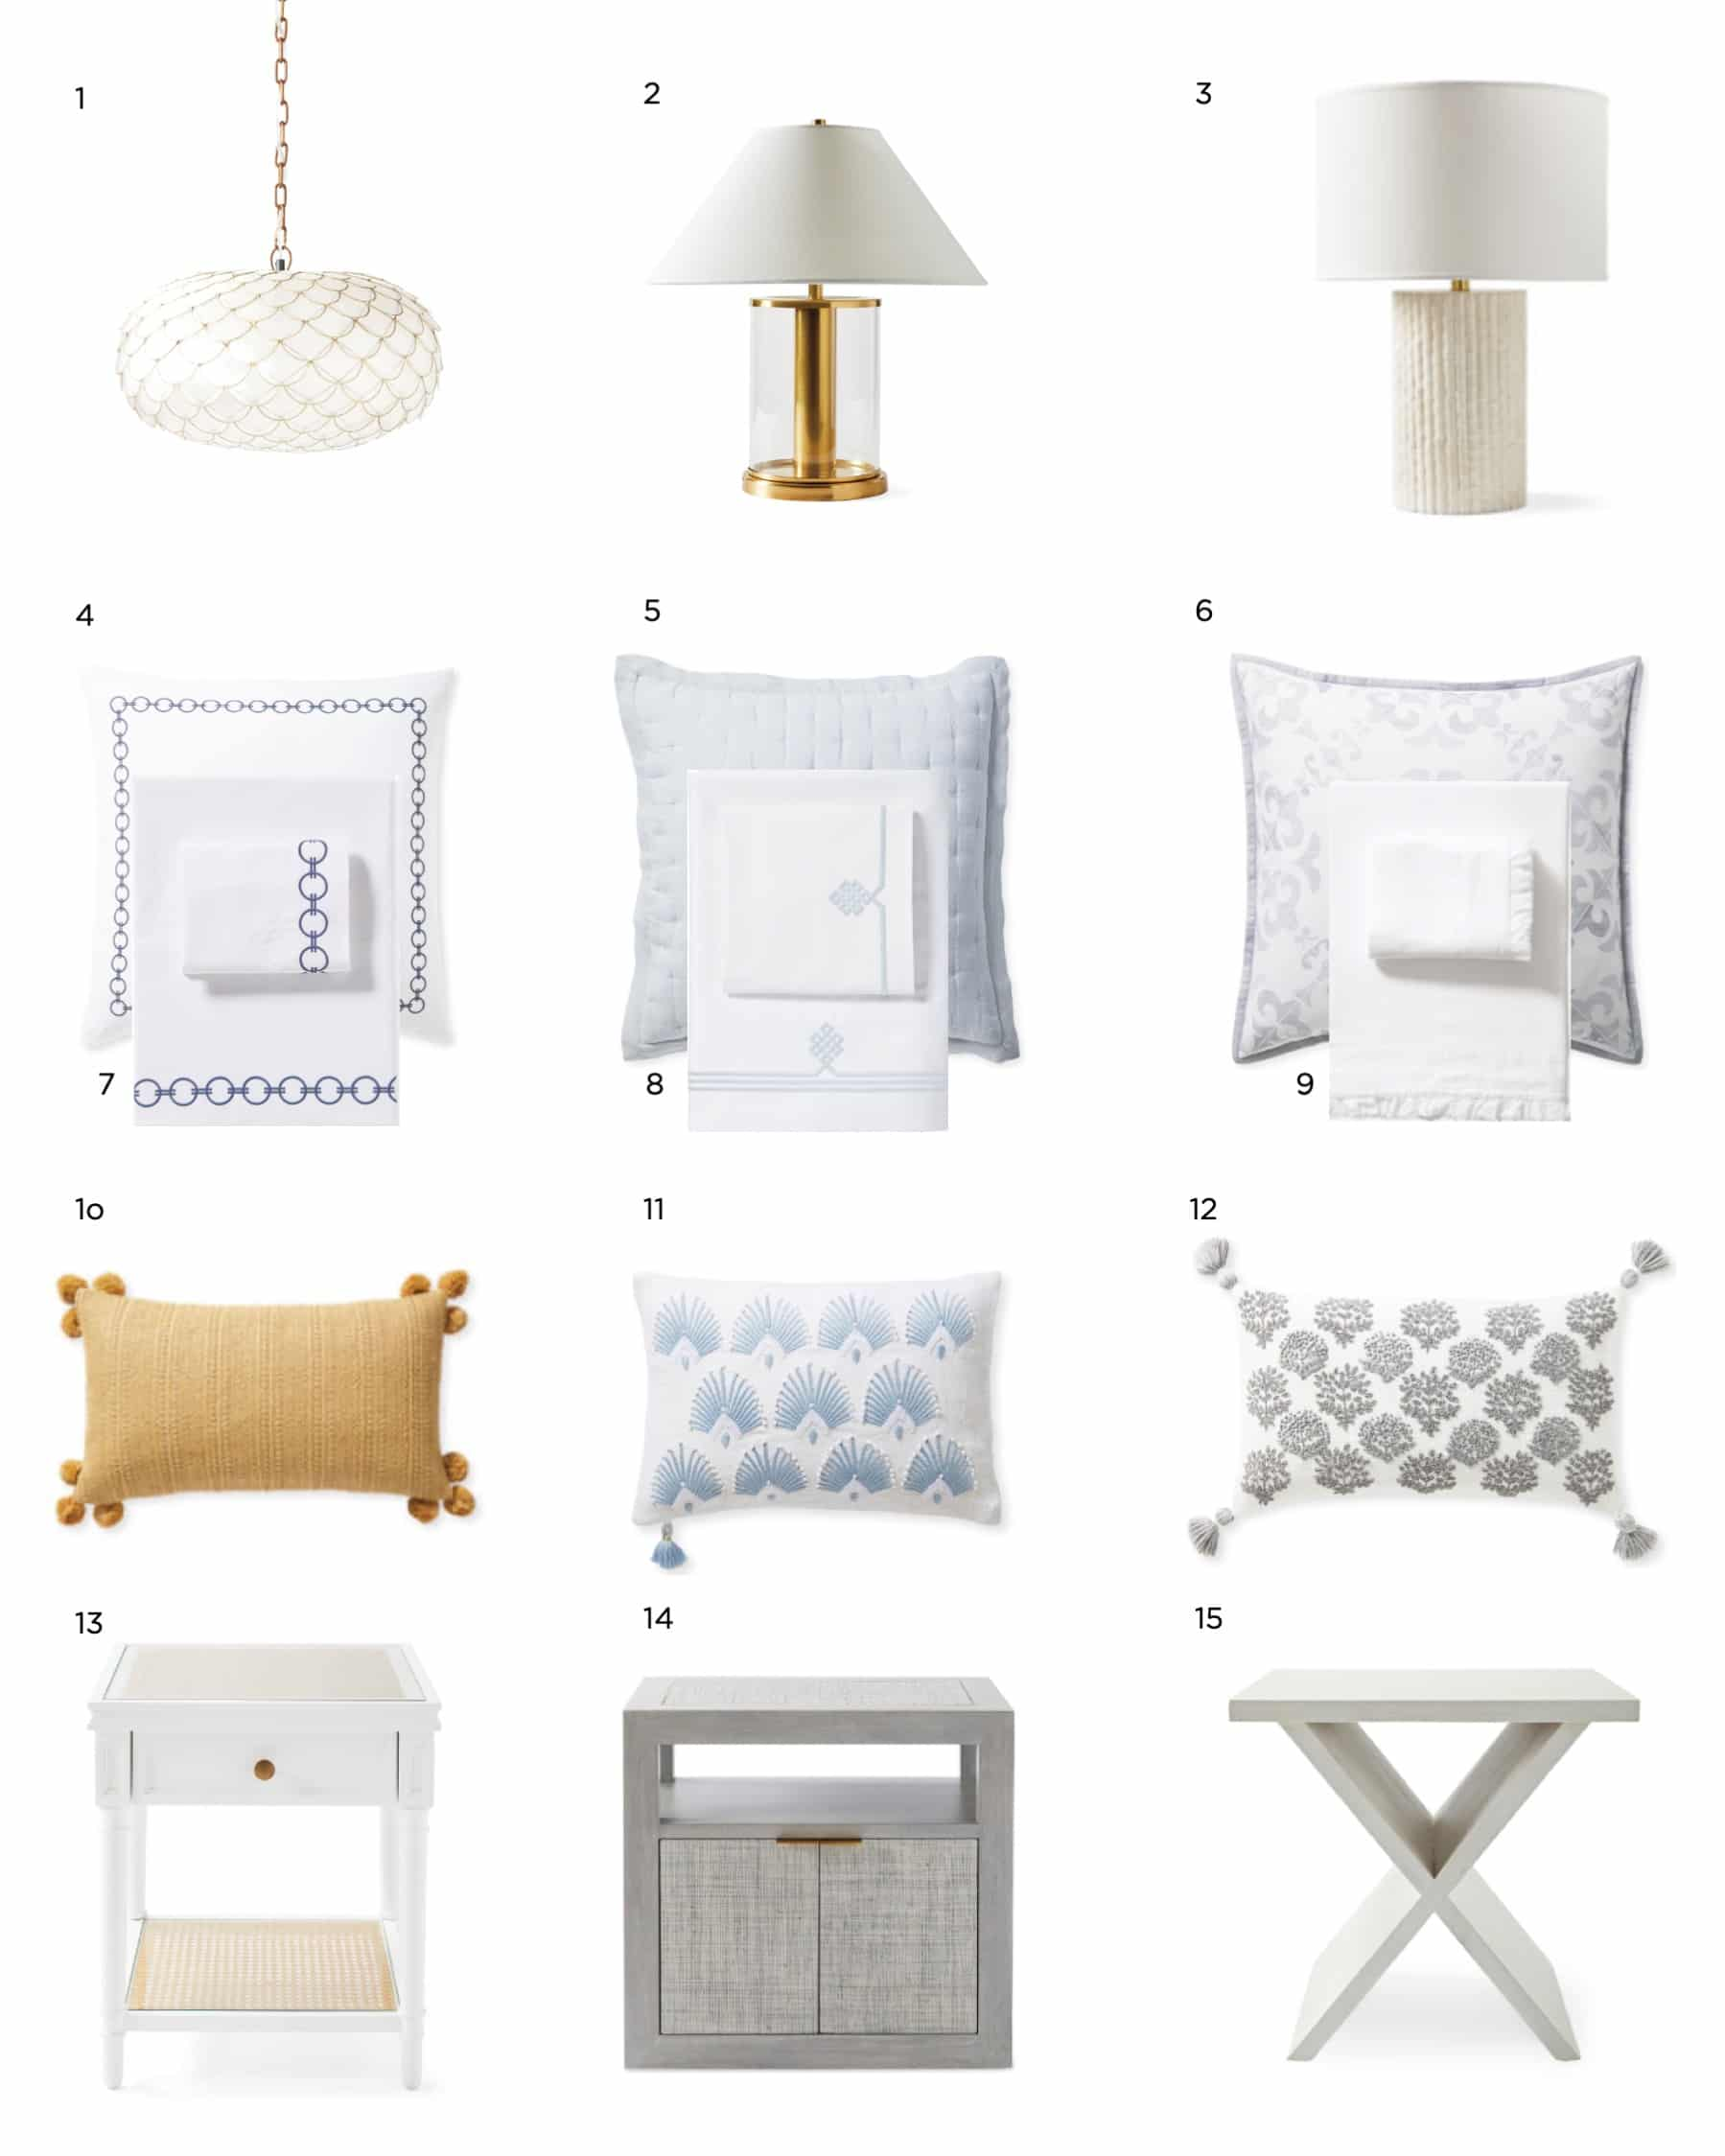 Guest Ready Bedroom Accents Pillows Lamps Sheets Jill Shevlin Design Vero Beach